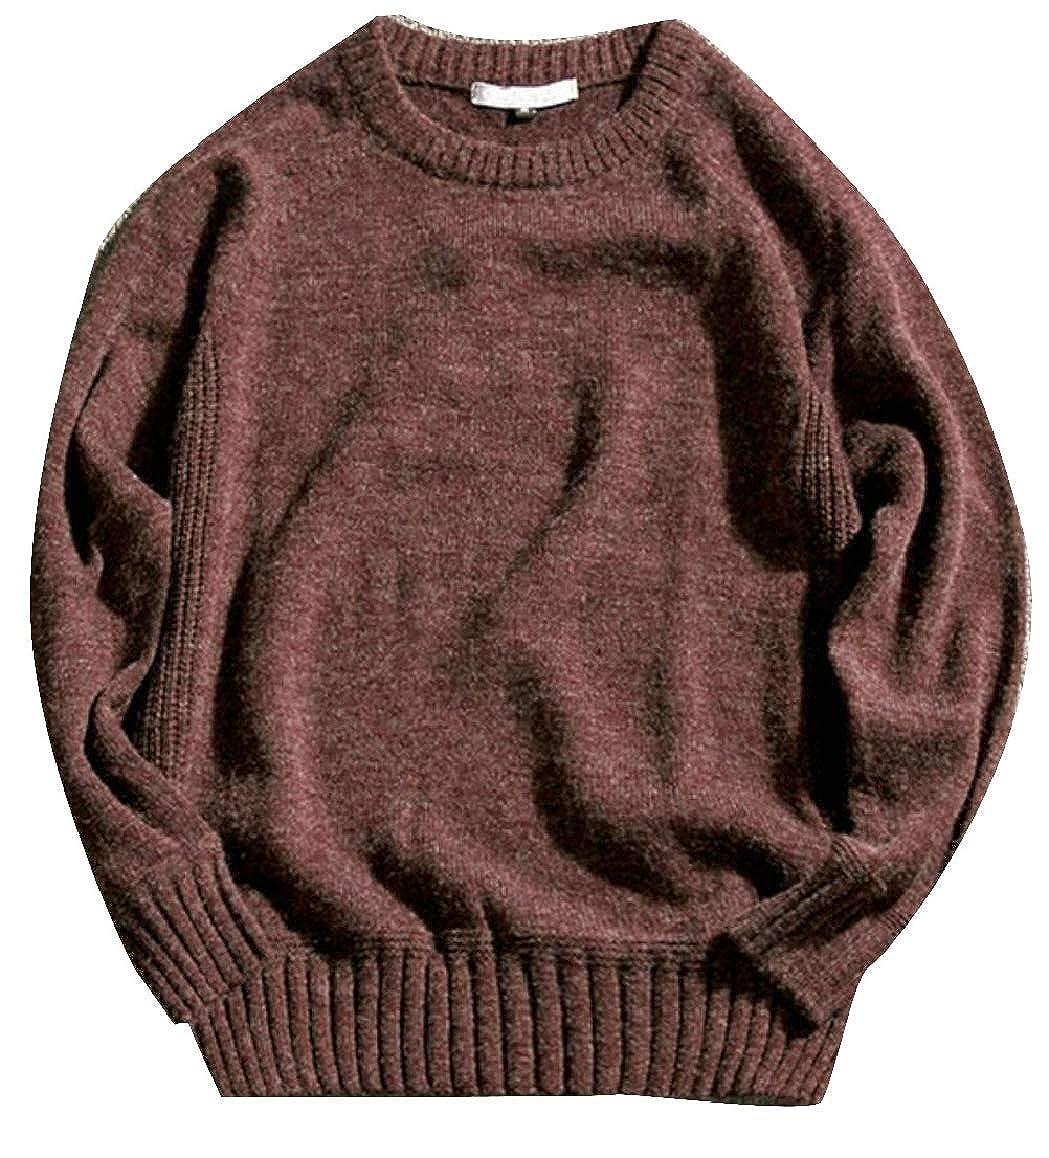 Qiangjinjiu Men Pullover Sweaters Knit Crew Neck Slim Fit Long Sleeve Plain Casual Sweaters